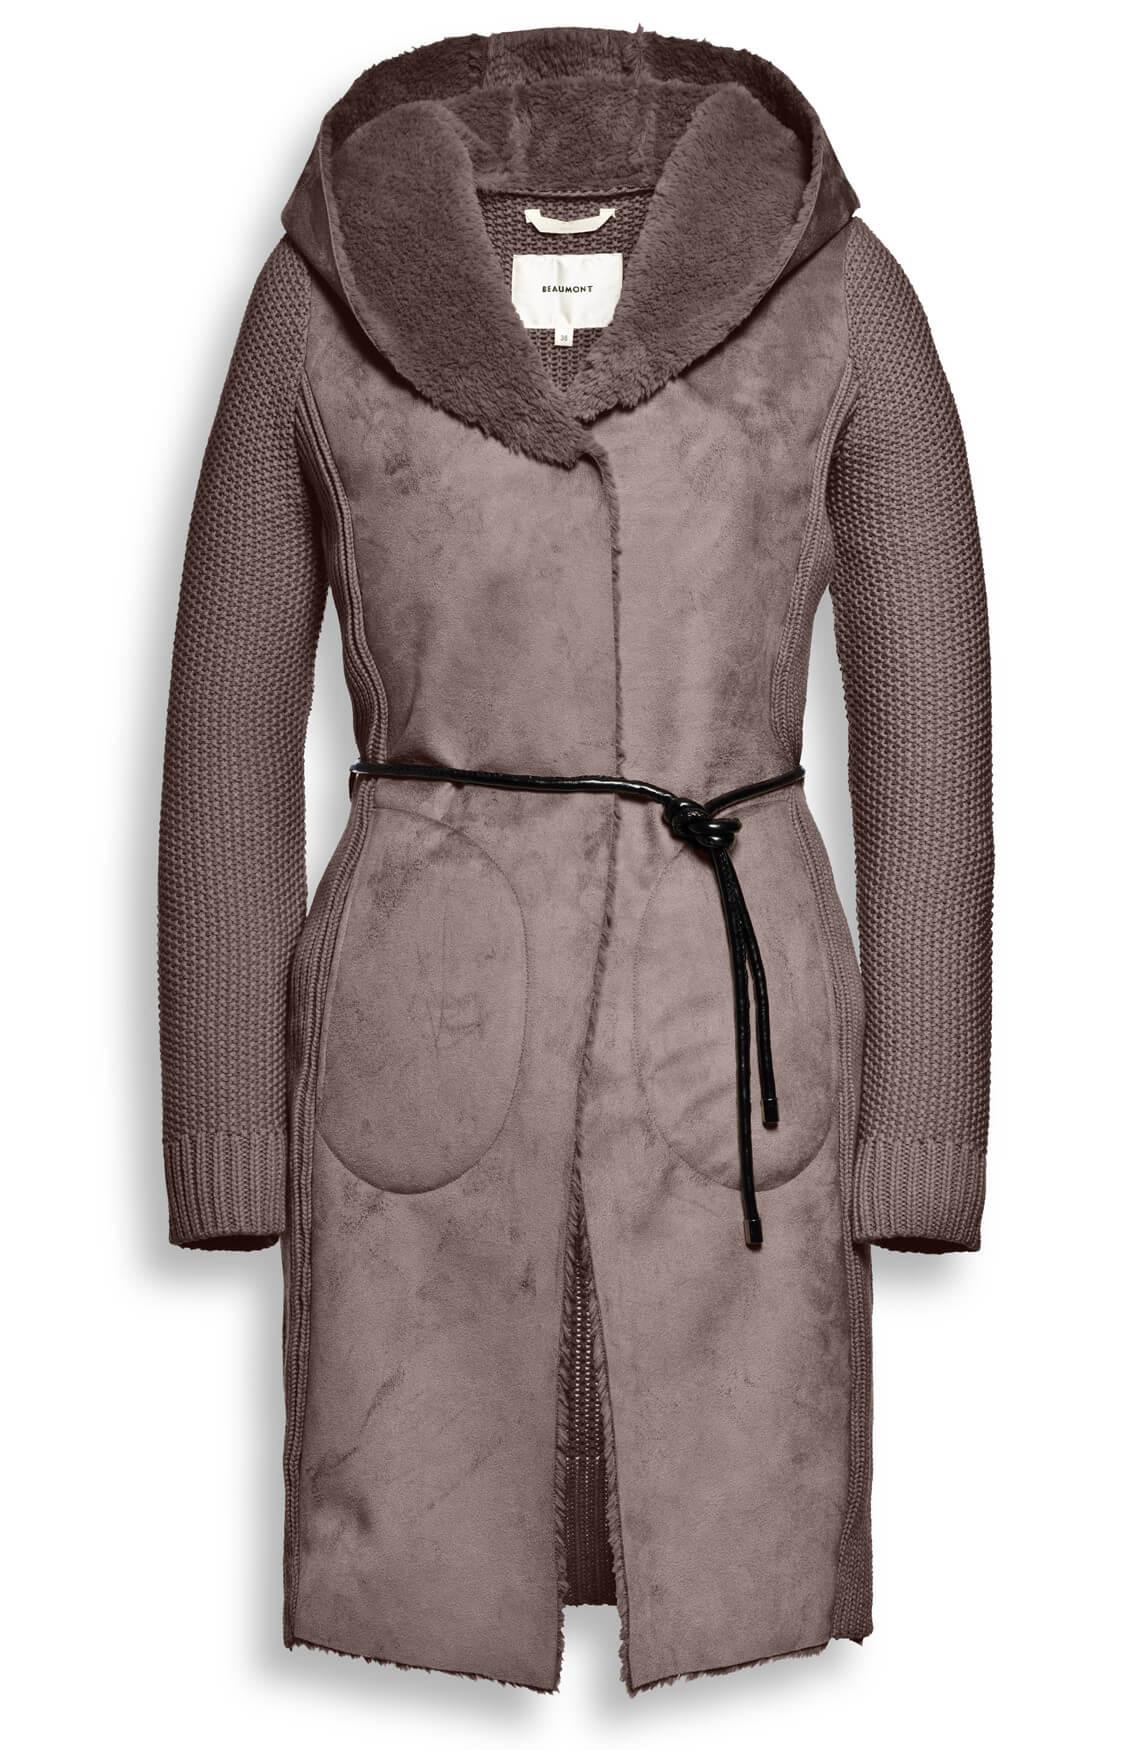 Beaumont Dames Vest met fake fur kraag Bruin